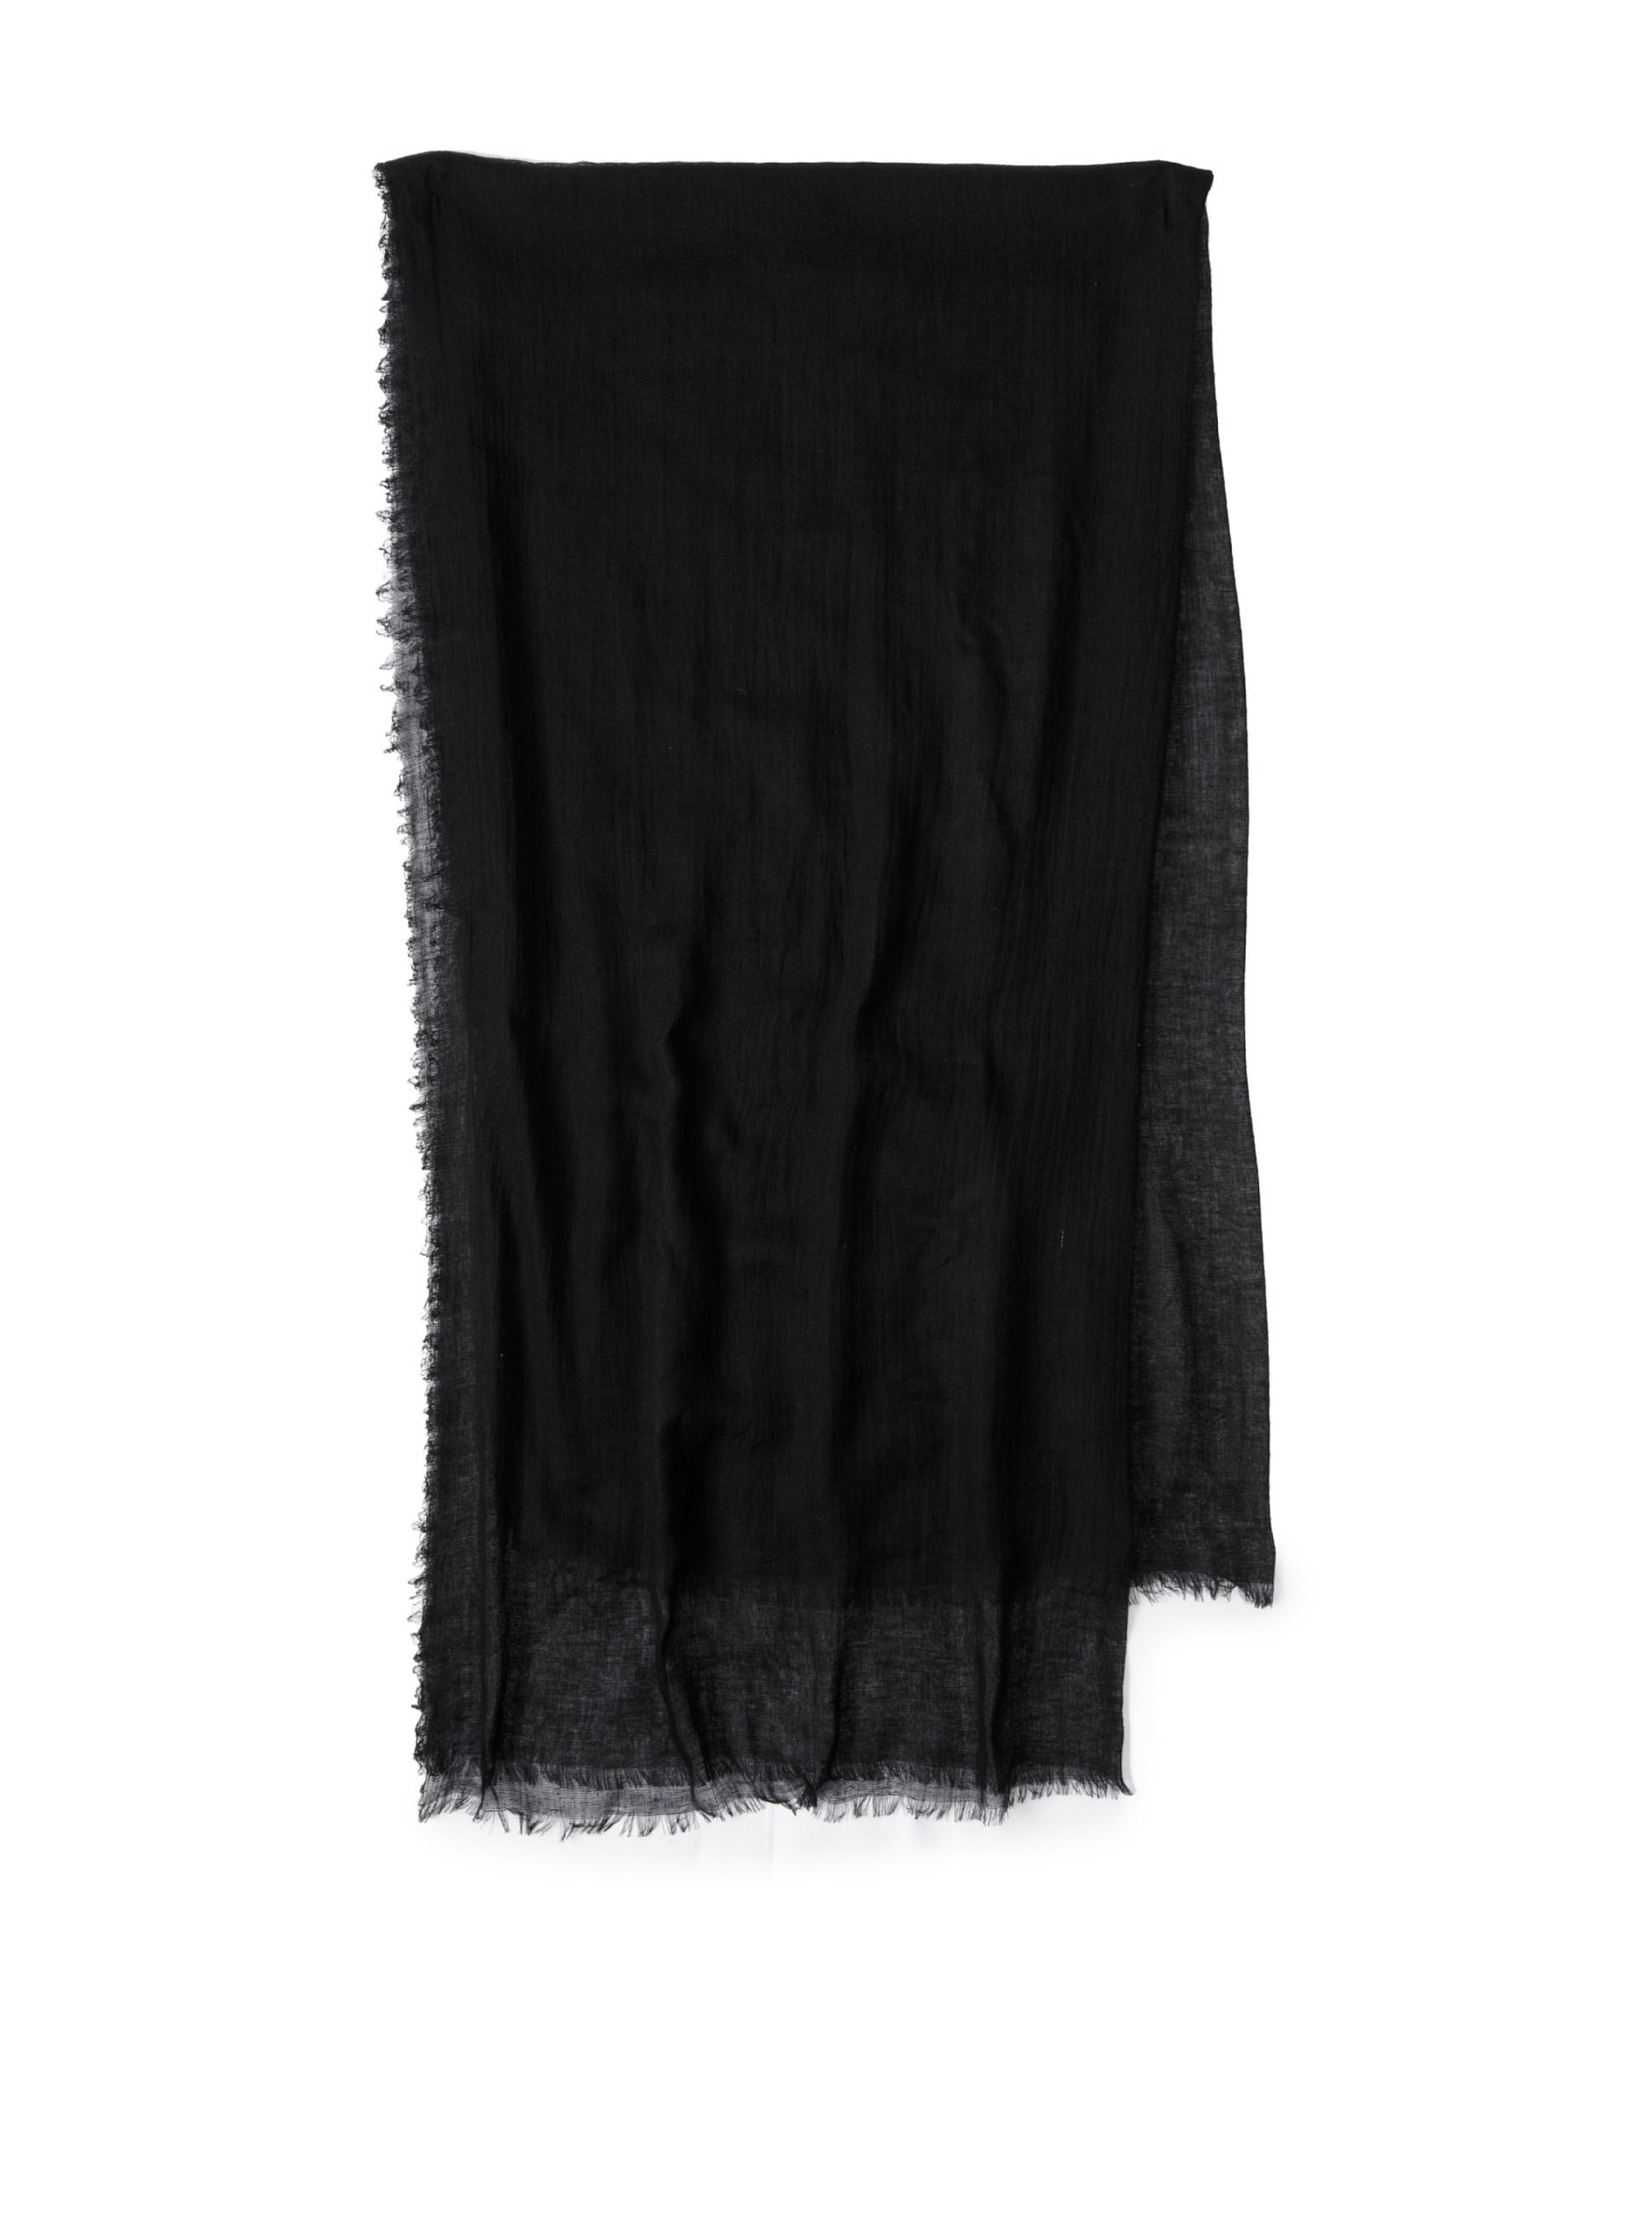 Carolina Amato Women's Cotton Gauze Wrap (Black)